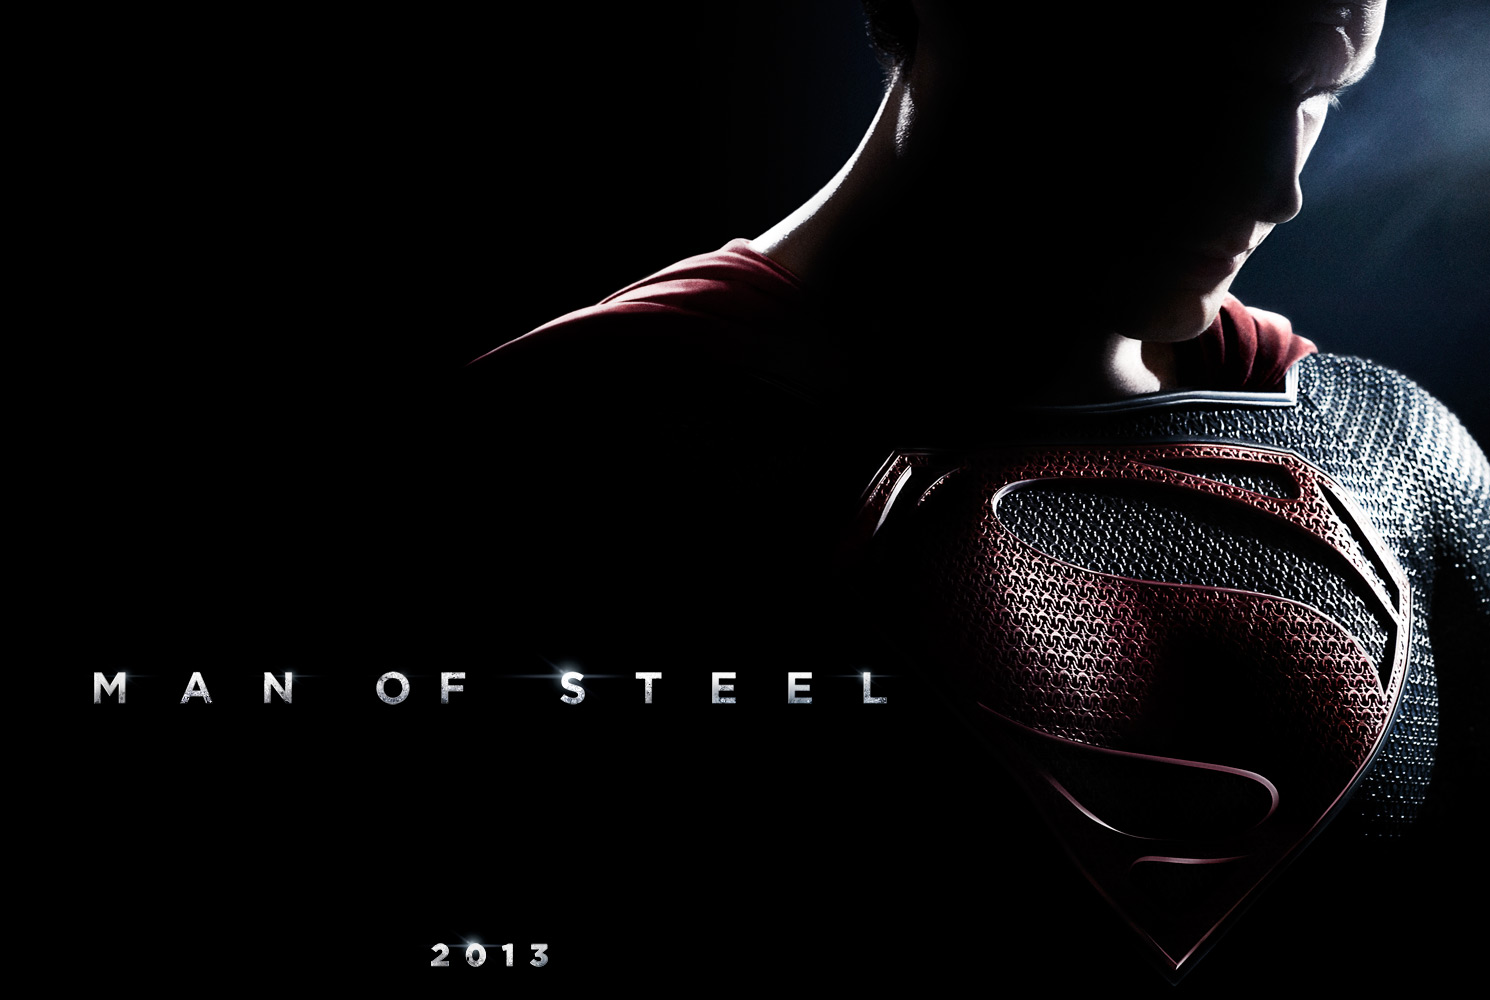 Superman Man of Steel Sinopsis y Spot de TV 1490x1000